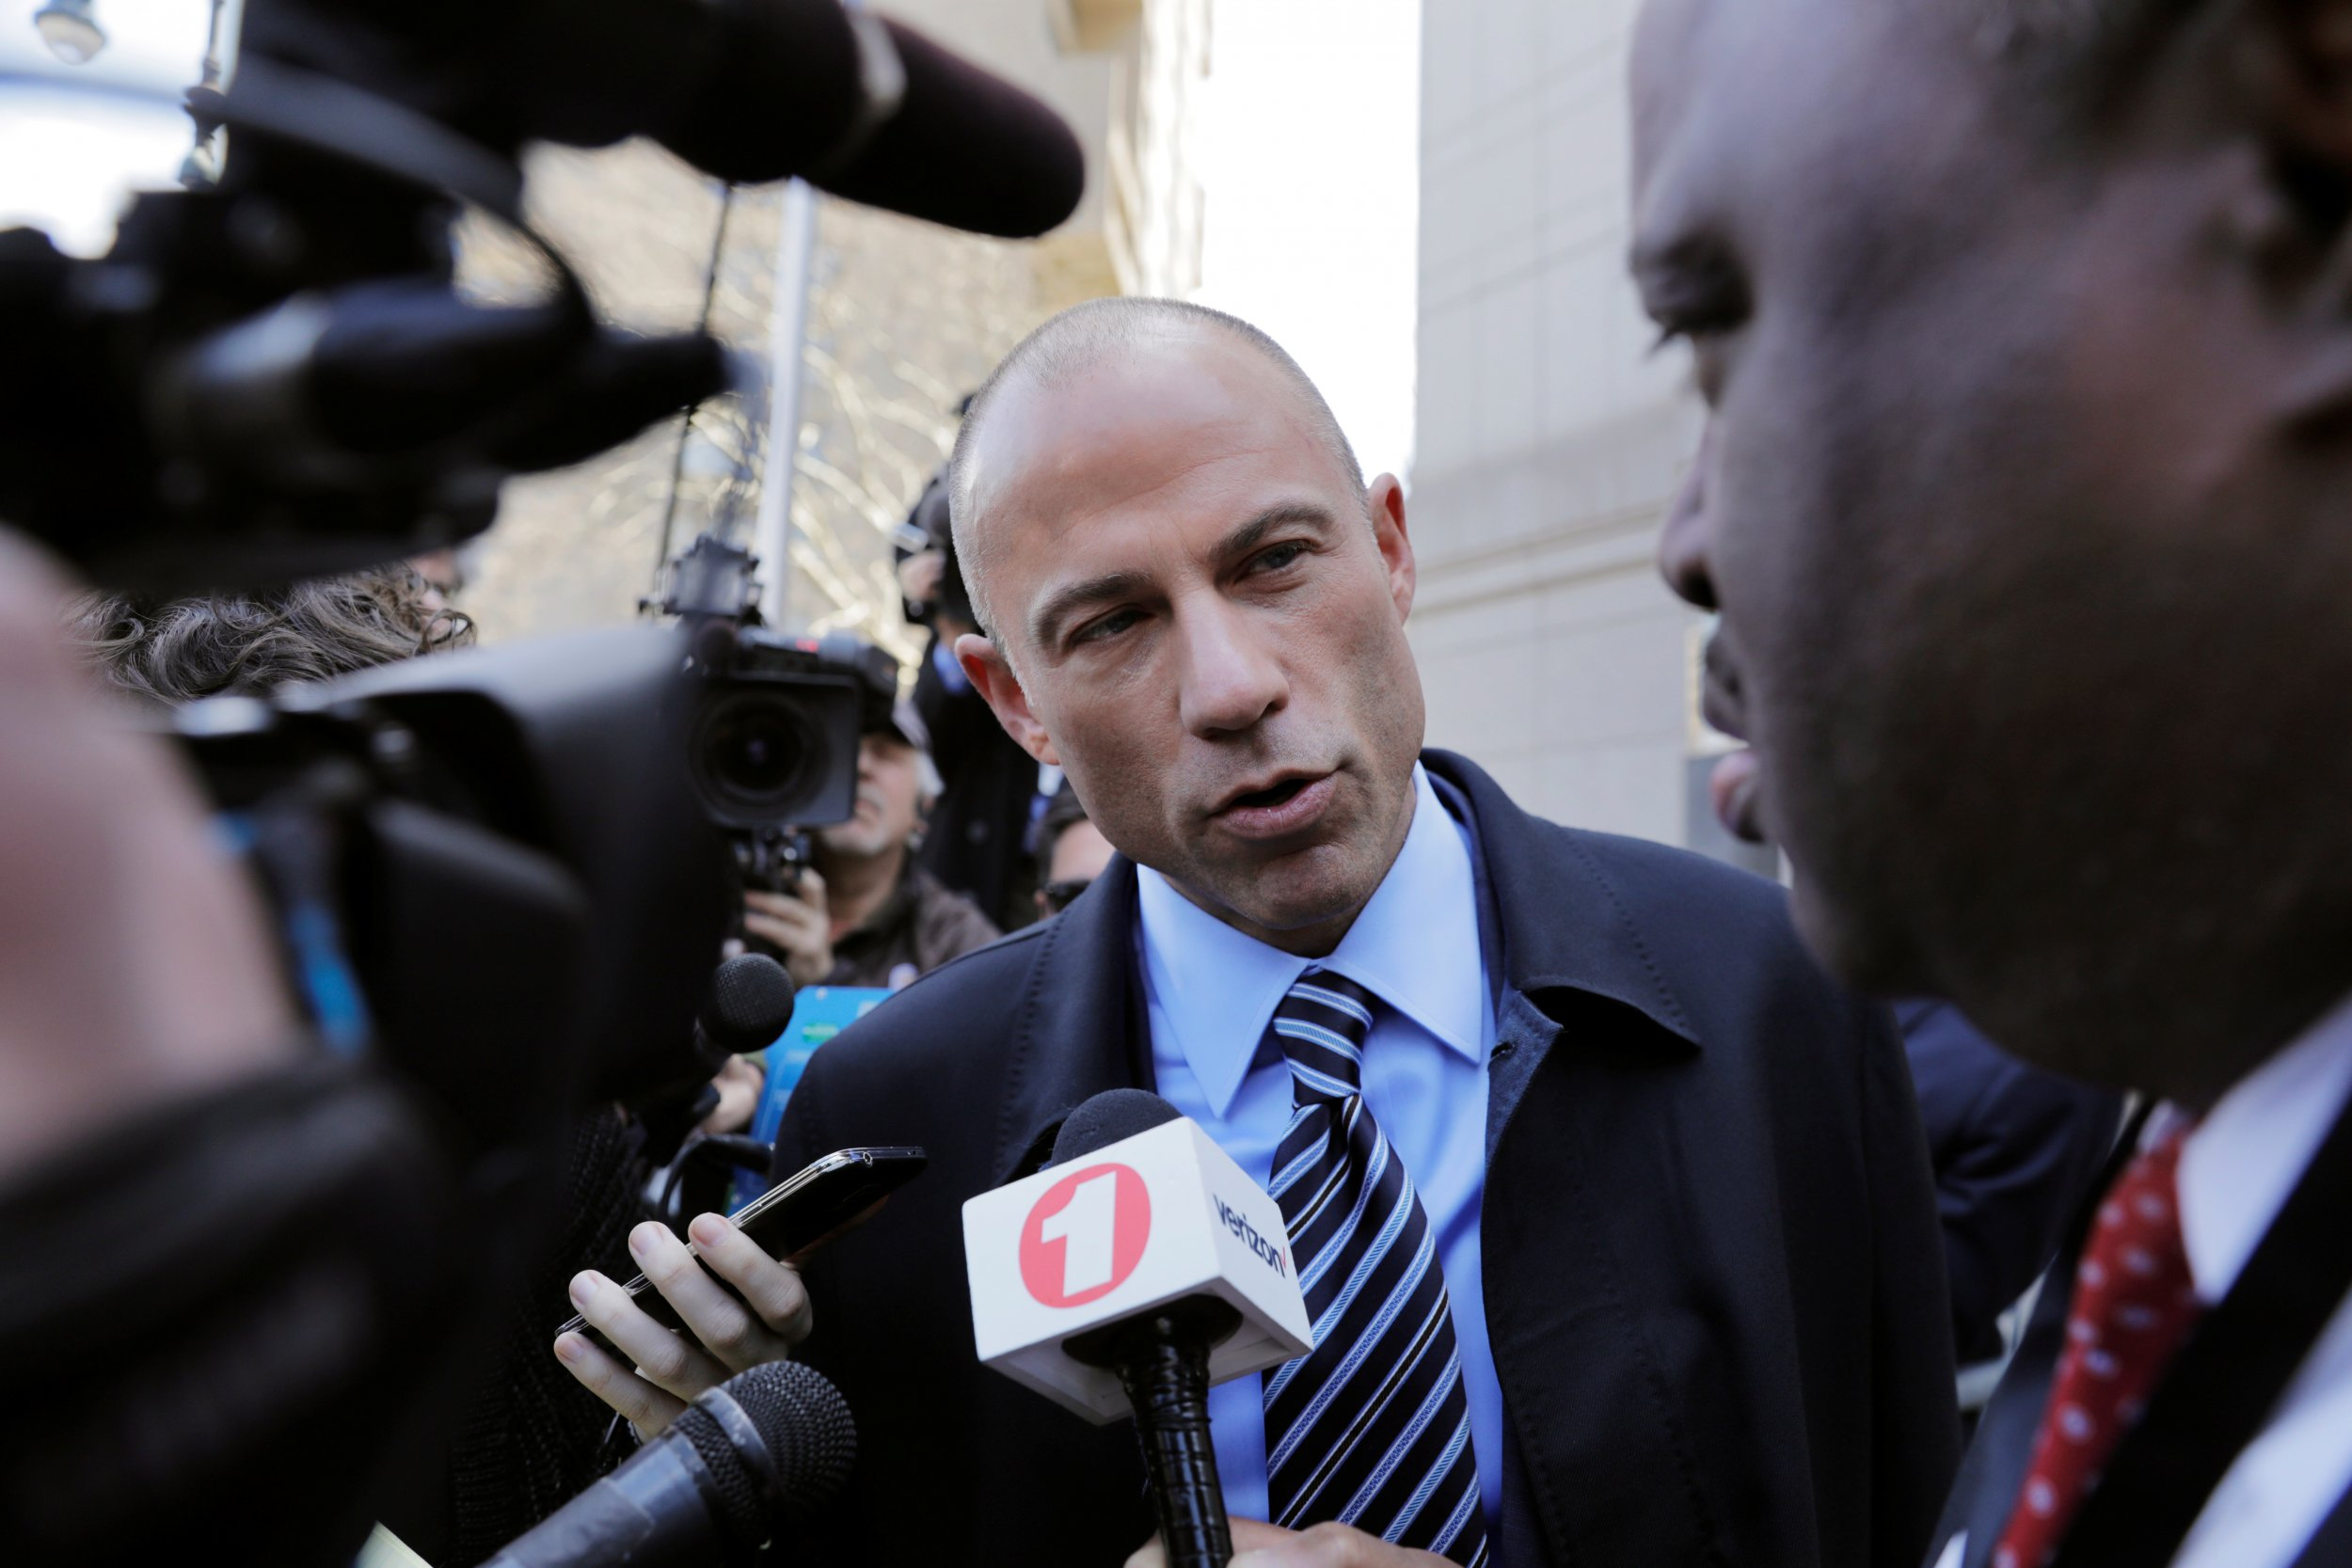 michael avenatti  trump lawyer cohen knew stormy daniels